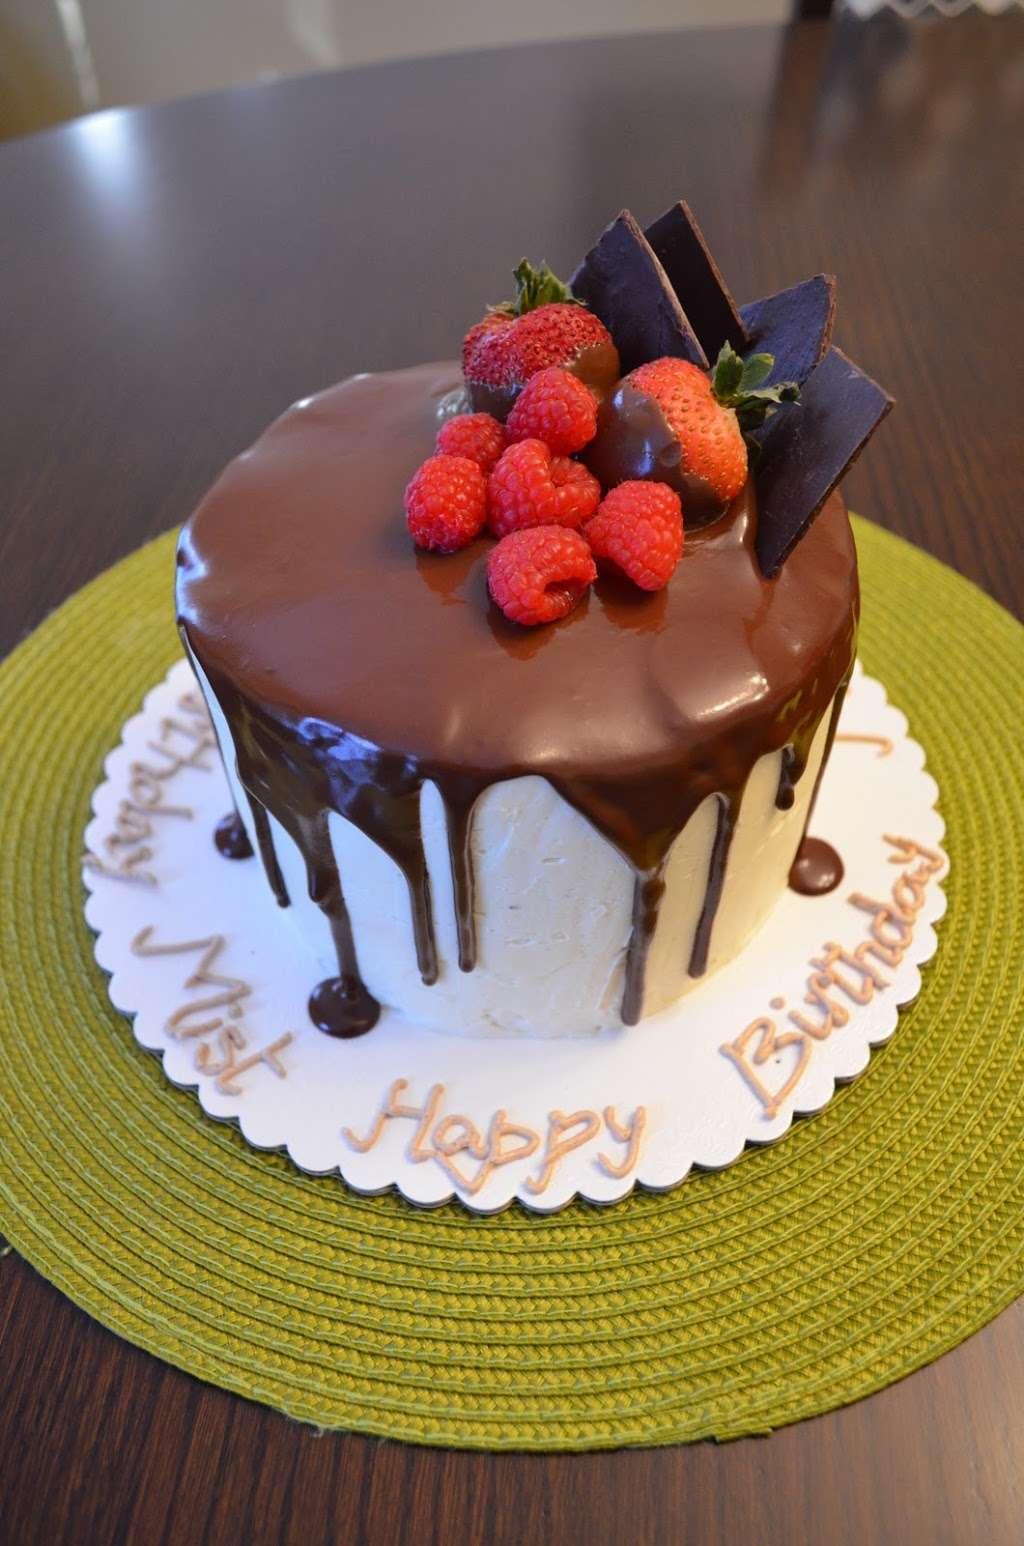 Melt in Your Mouth LLC - bakery  | Photo 6 of 10 | Address: 15 Cypress Ln, Walpole, MA 02081, USA | Phone: (972) 740-3204